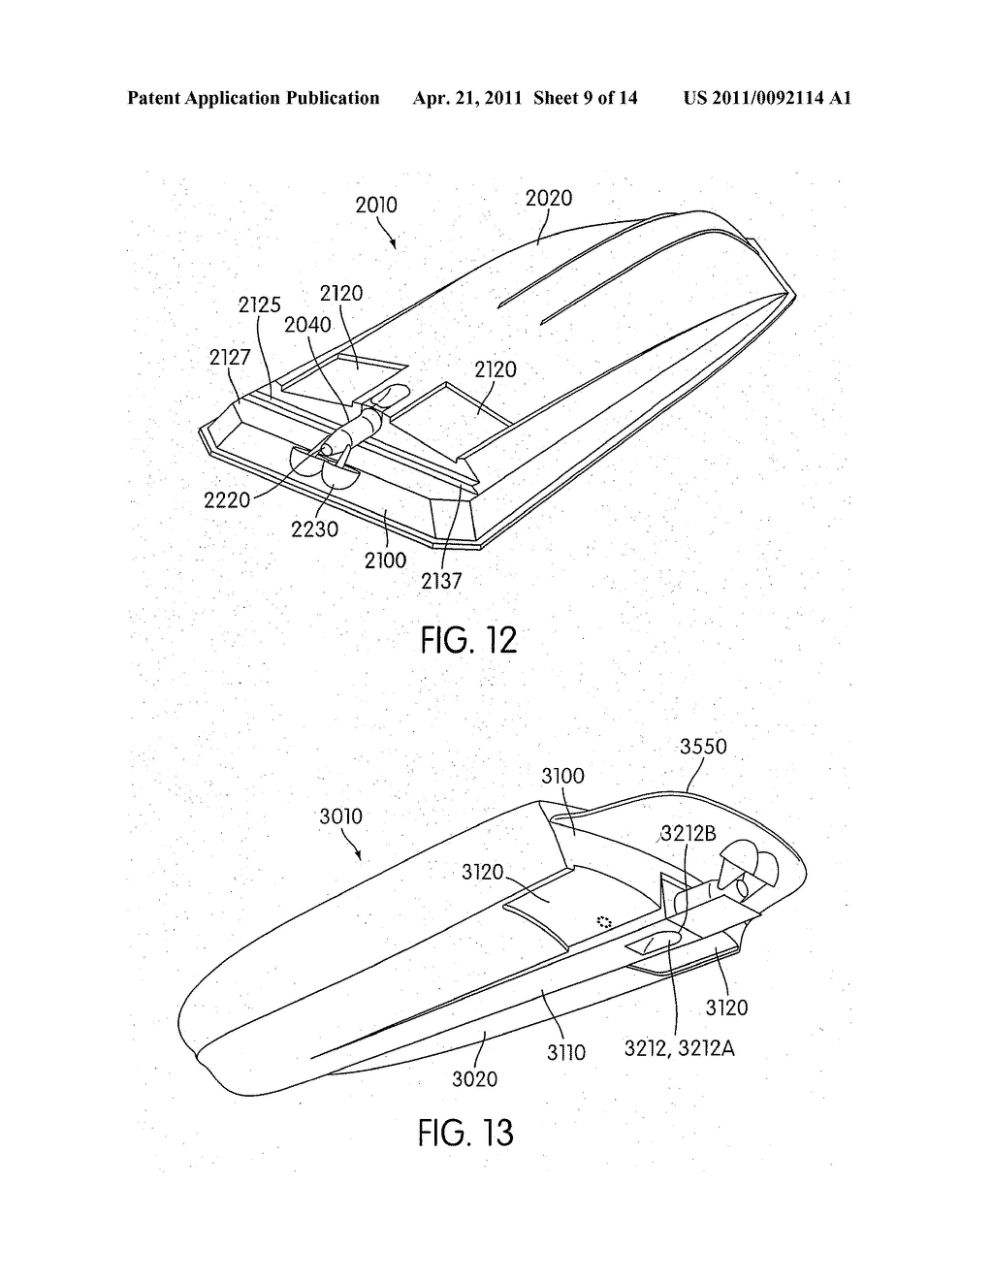 [DIAGRAM] Yamaha Jet Boat Wiring Diagram FULL Version HD